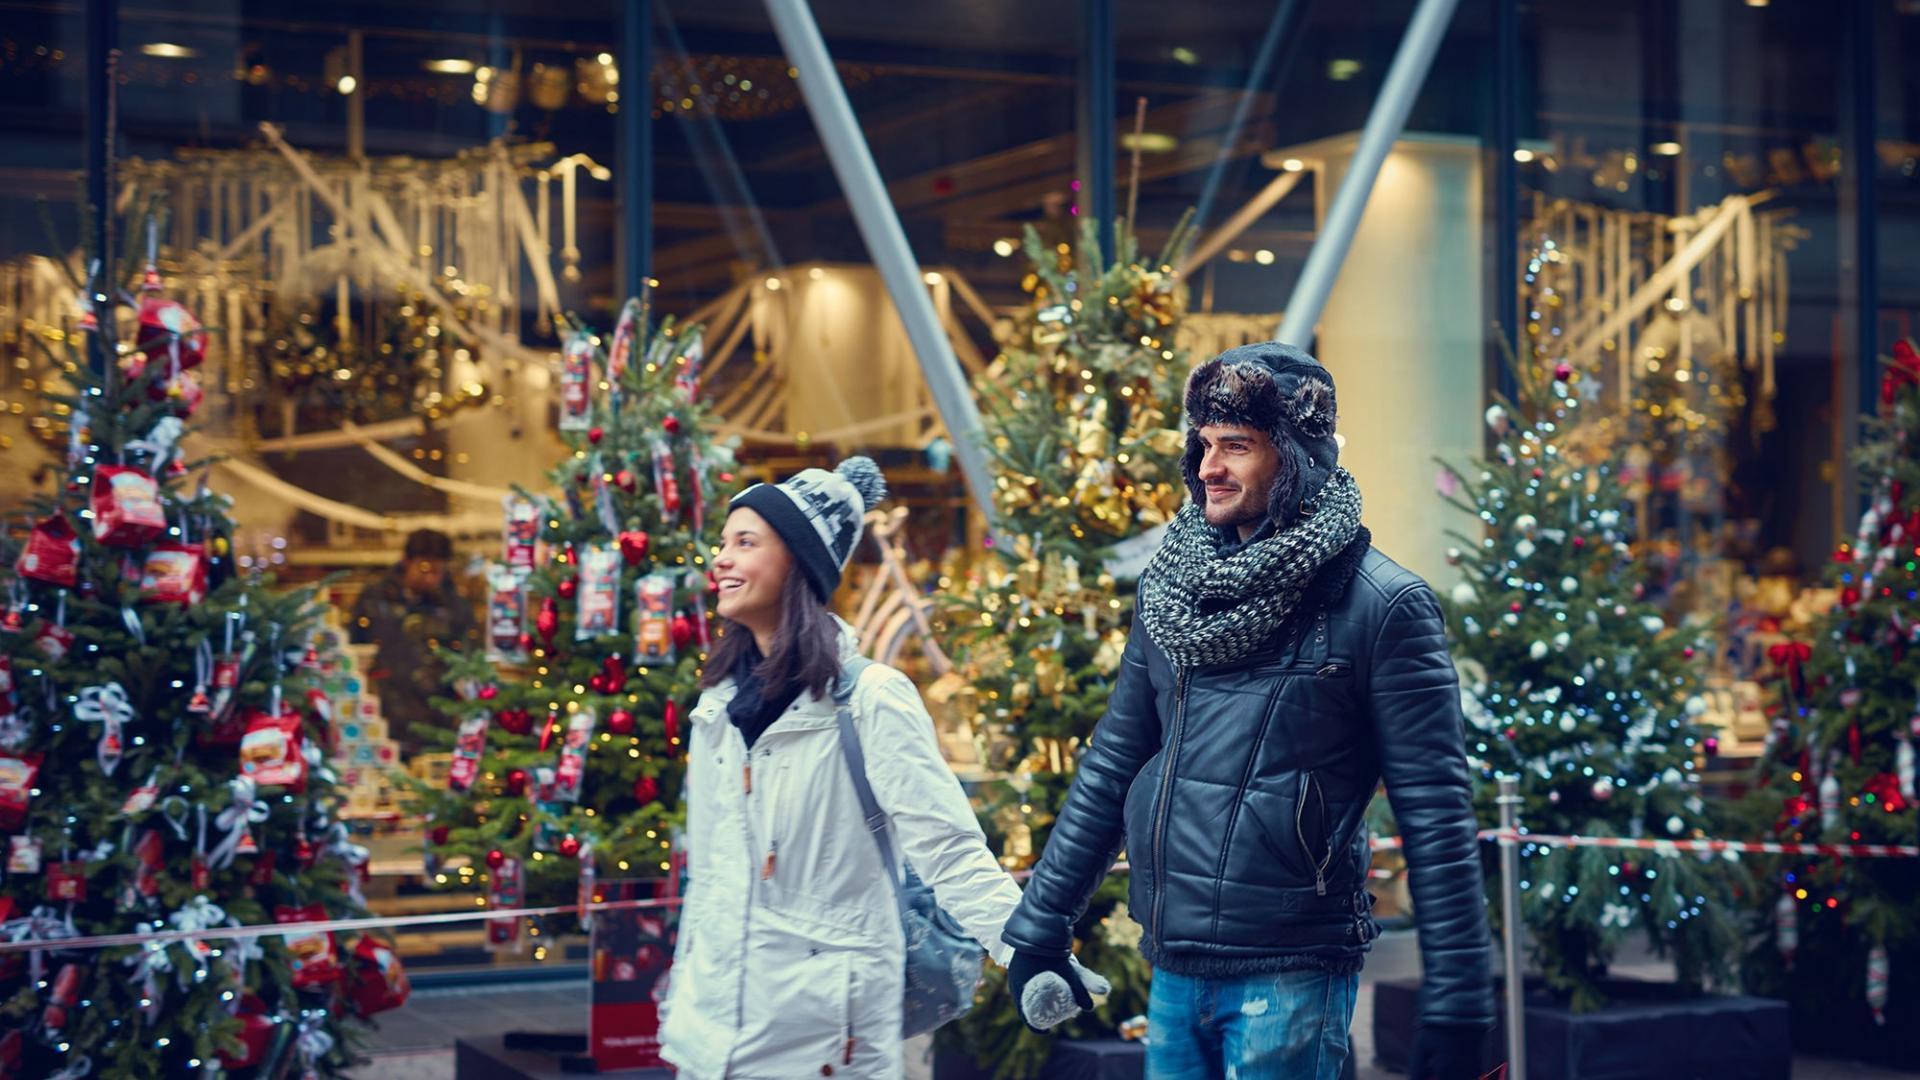 Kerstshoppen-in-Luik